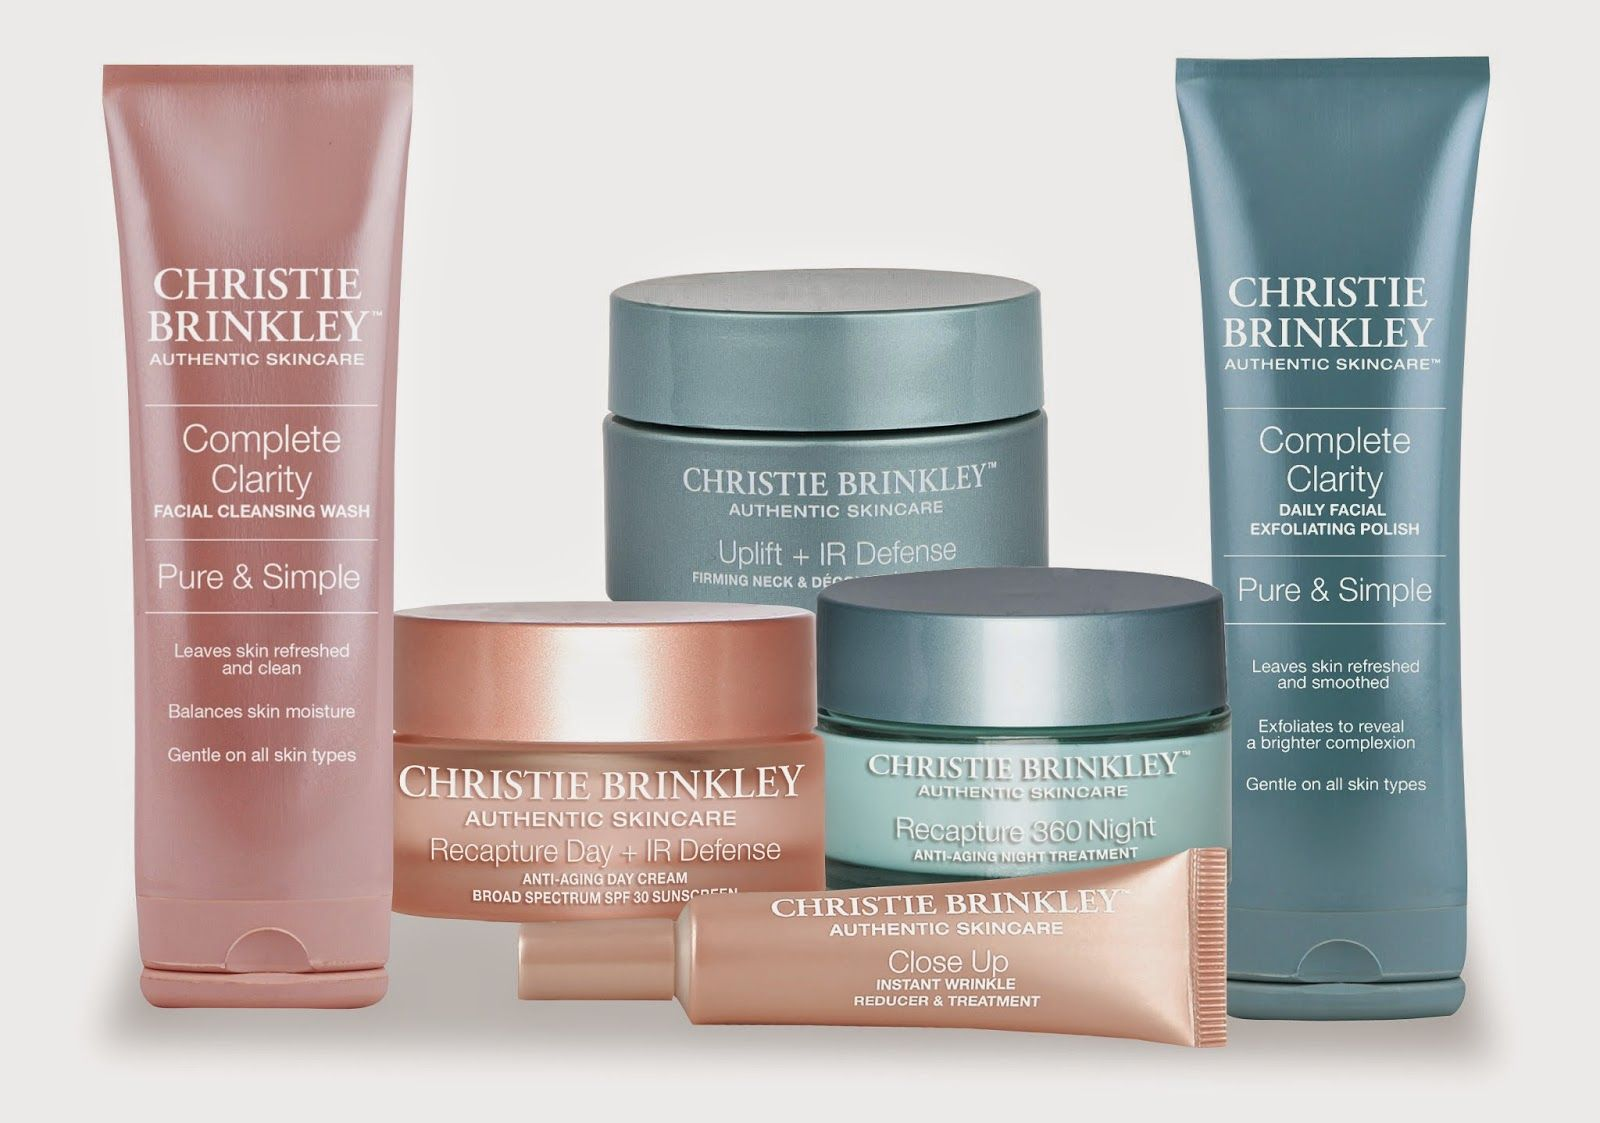 Ev Curl Gurl New Christie Brinkley S Skincare Line Authentic Skincare Christie Brinkley Skin Care Skin Care